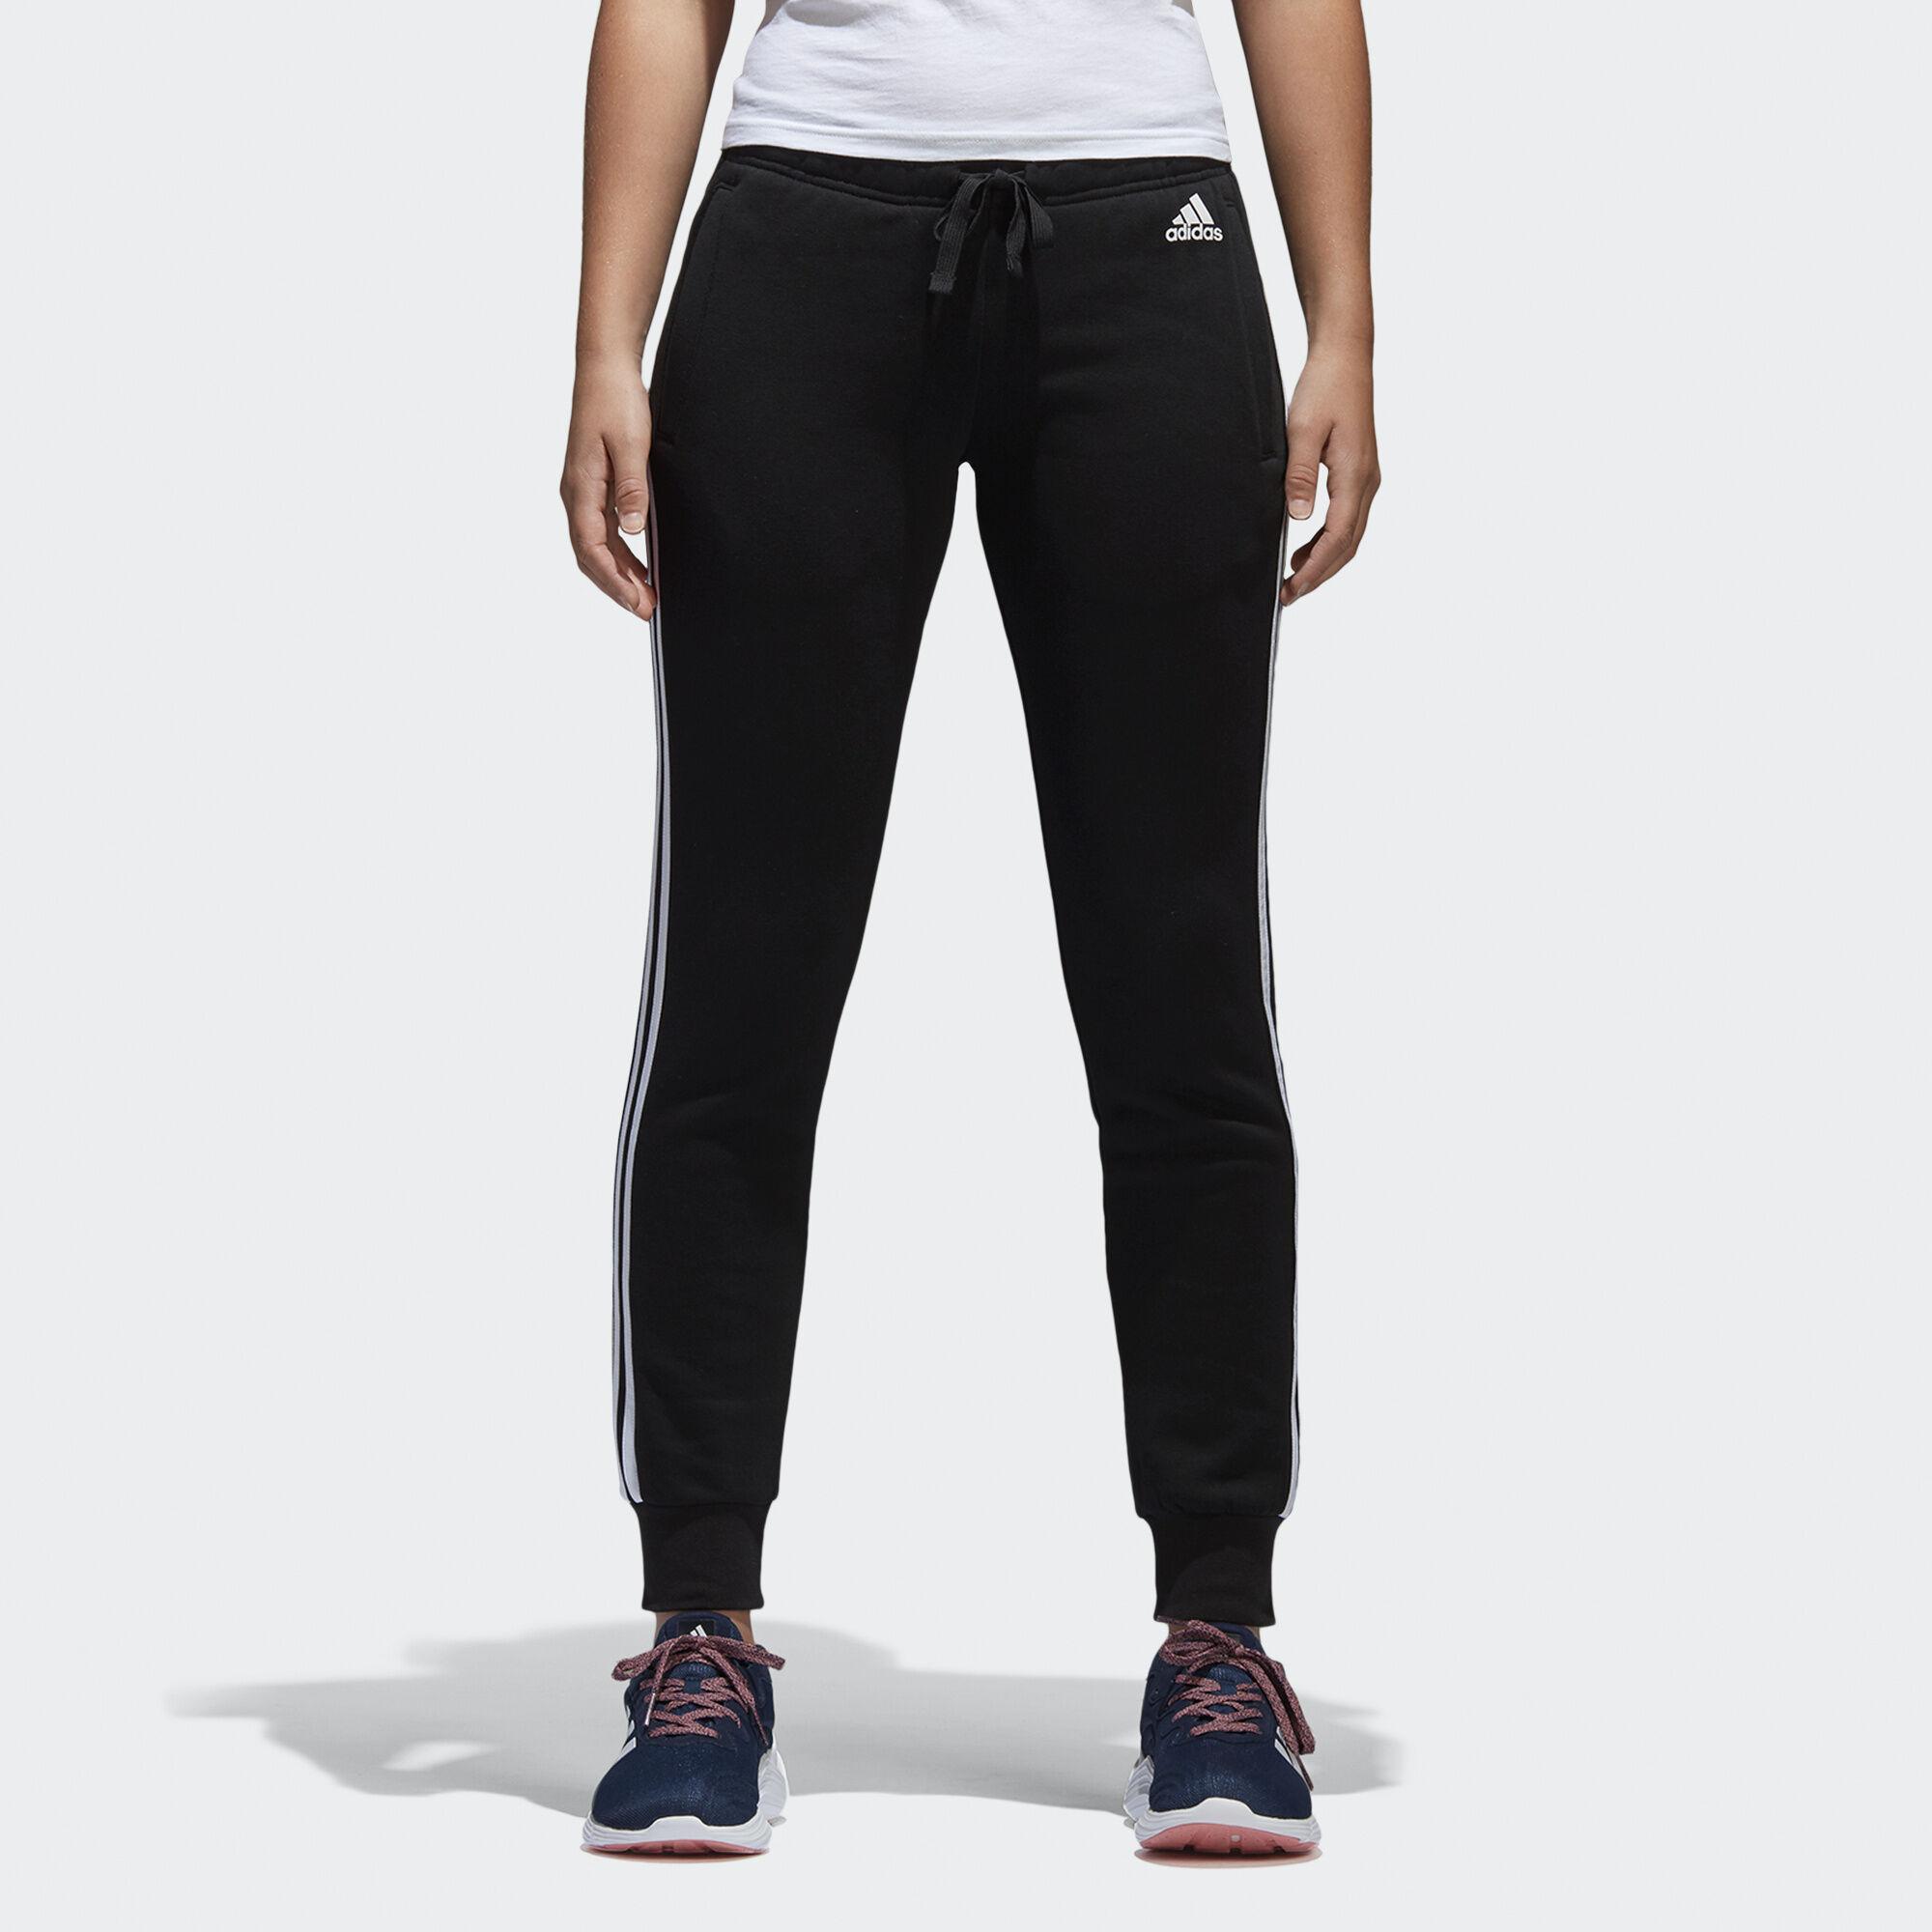 pantalon essential adidas,adidas pantalon essential lineage